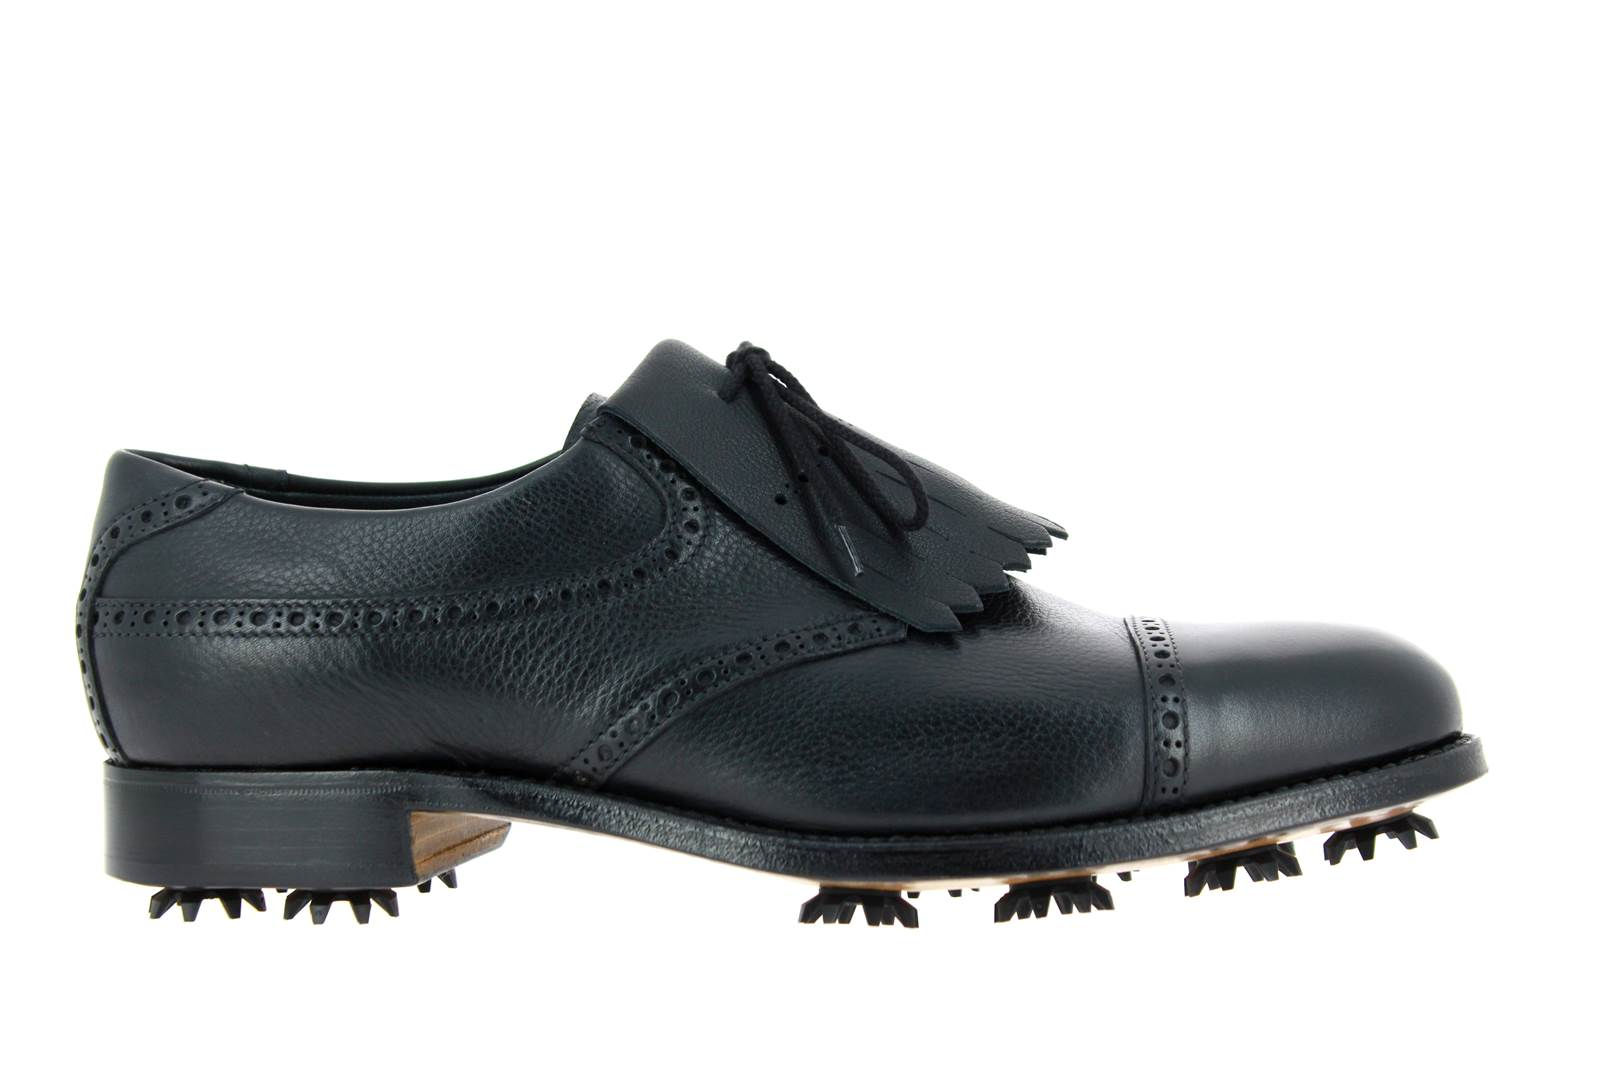 Gravati golf shoe CALF NERO